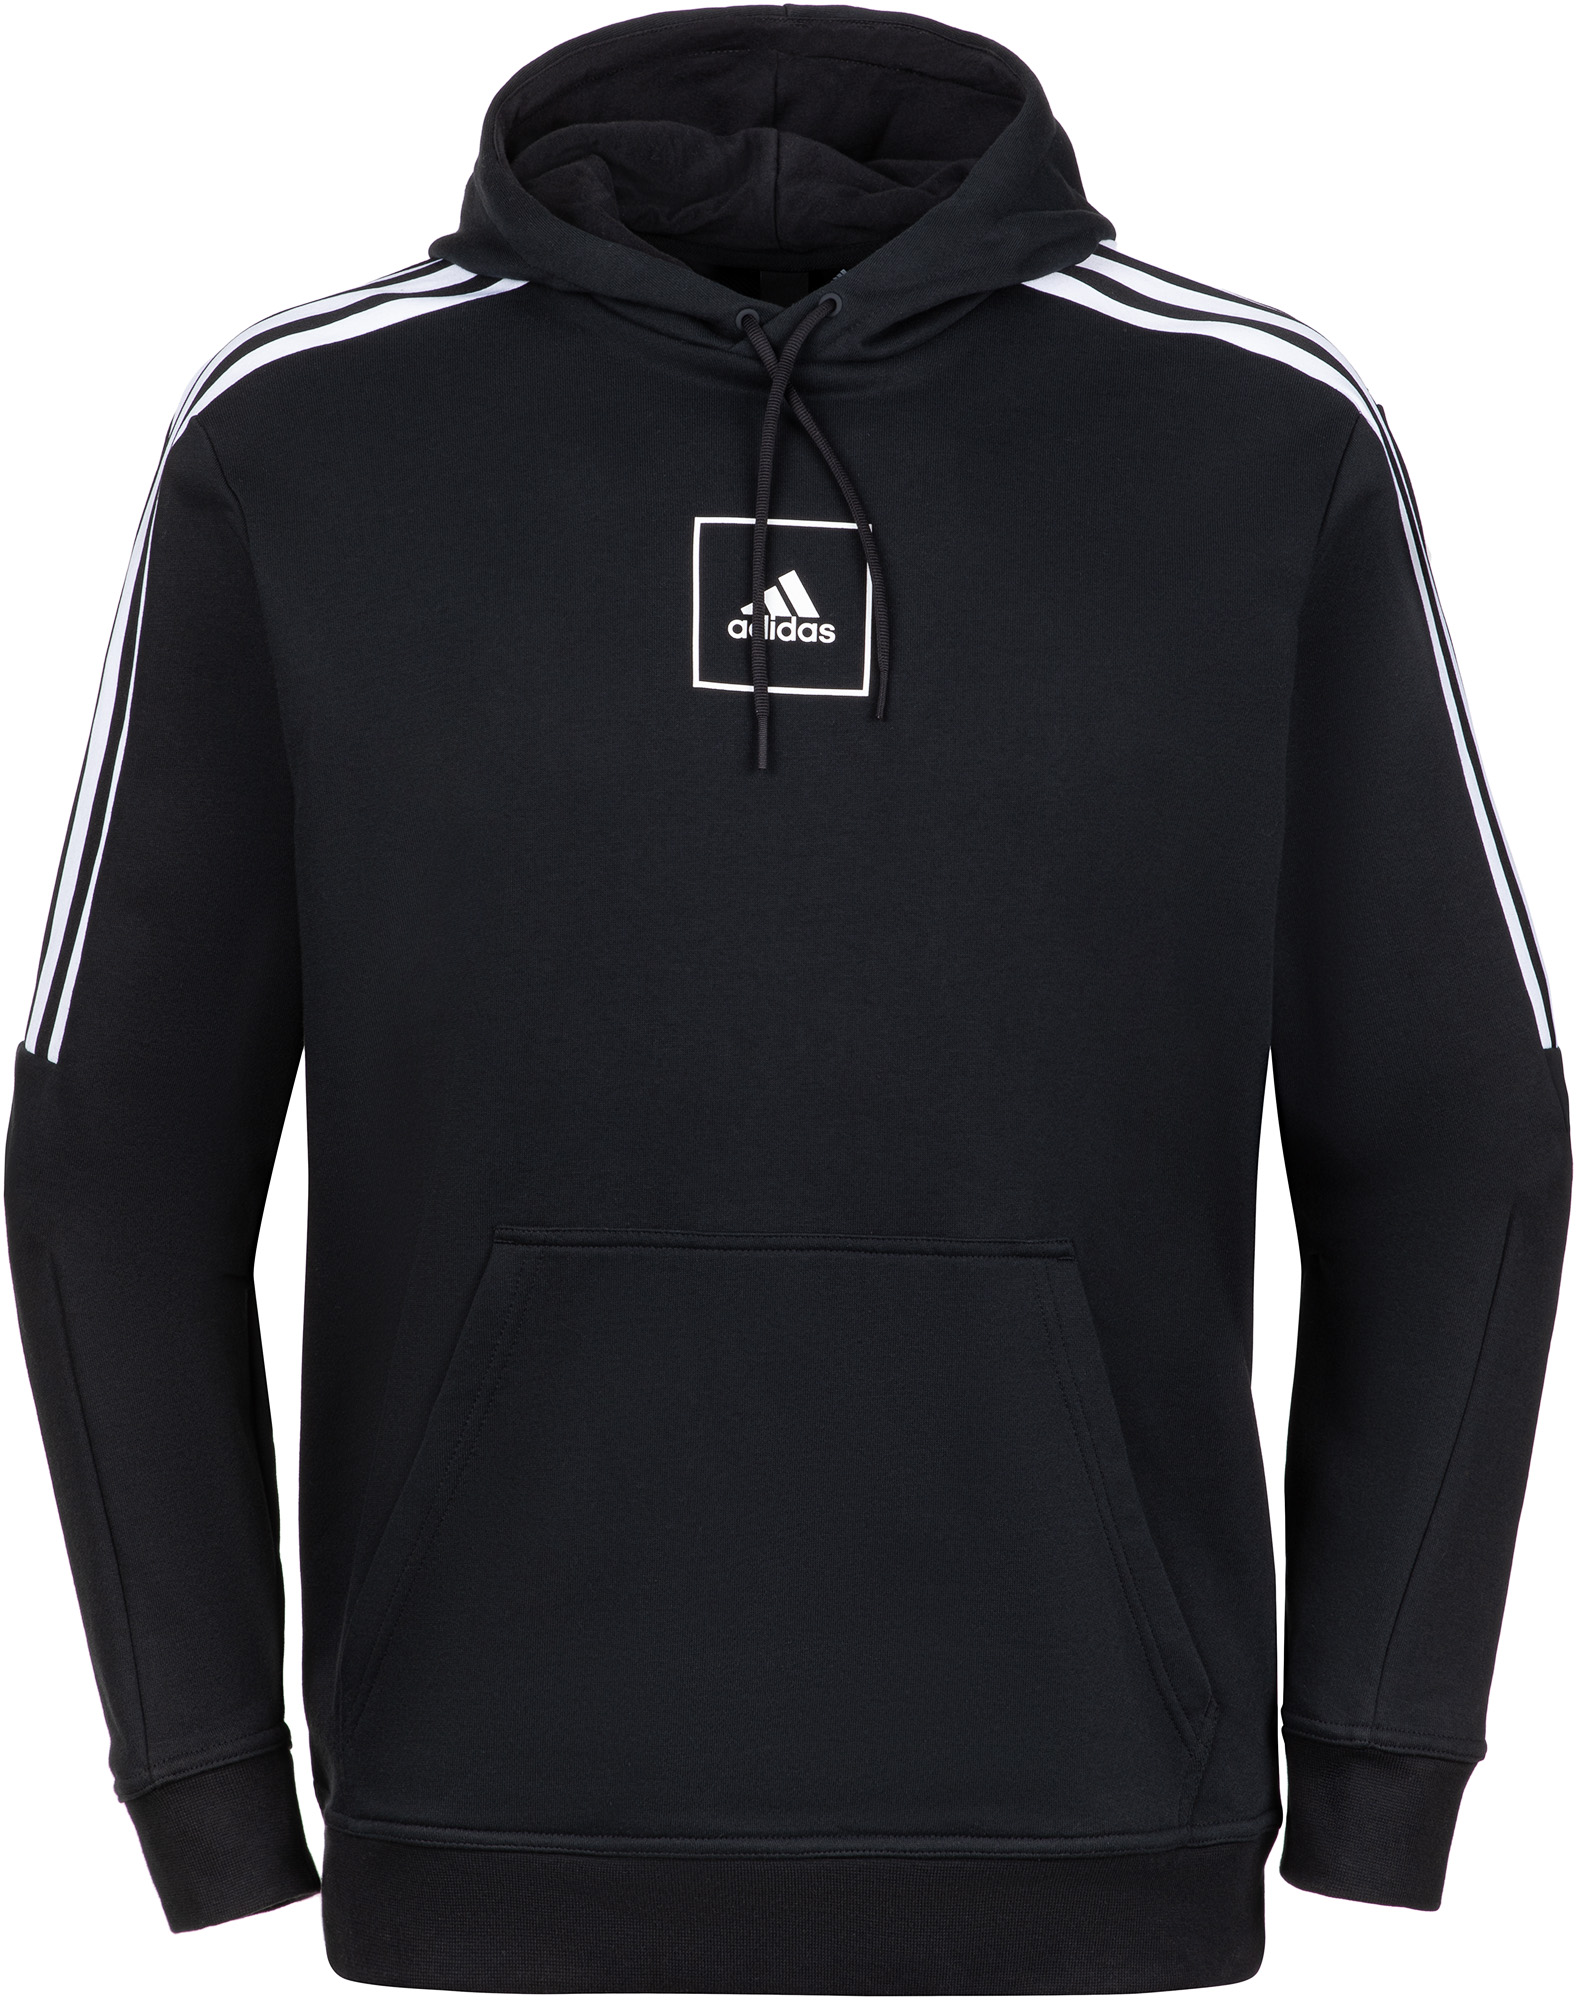 худи женское adidas ess 3s fz hd цвет серый розовый br2438 размер s 42 44 Adidas Худи мужская Adidas 3-Stripes, размер 44-46